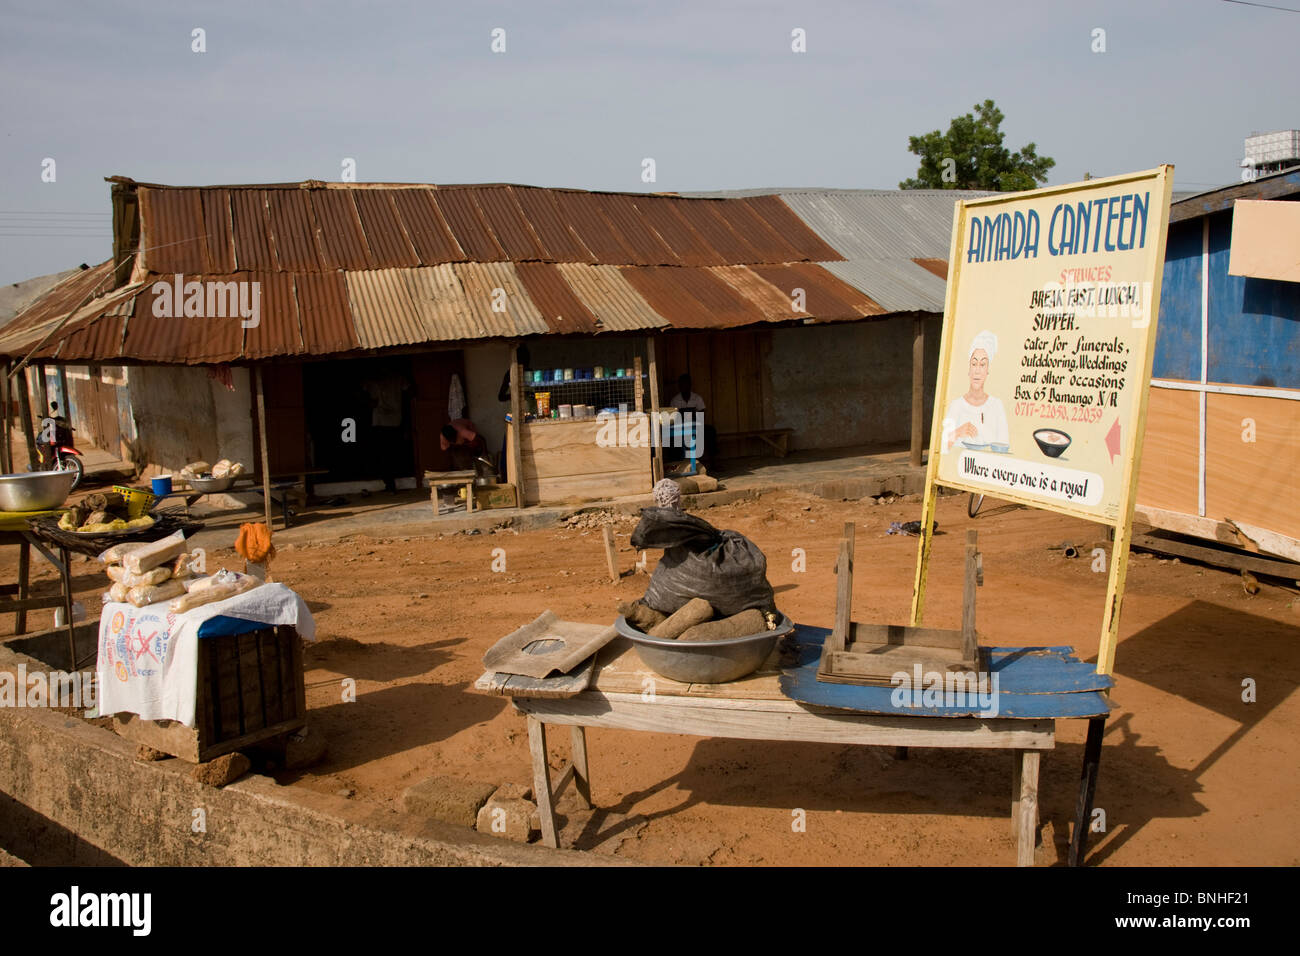 The only restaurant in Damango, northwest Ghana. - Stock Image